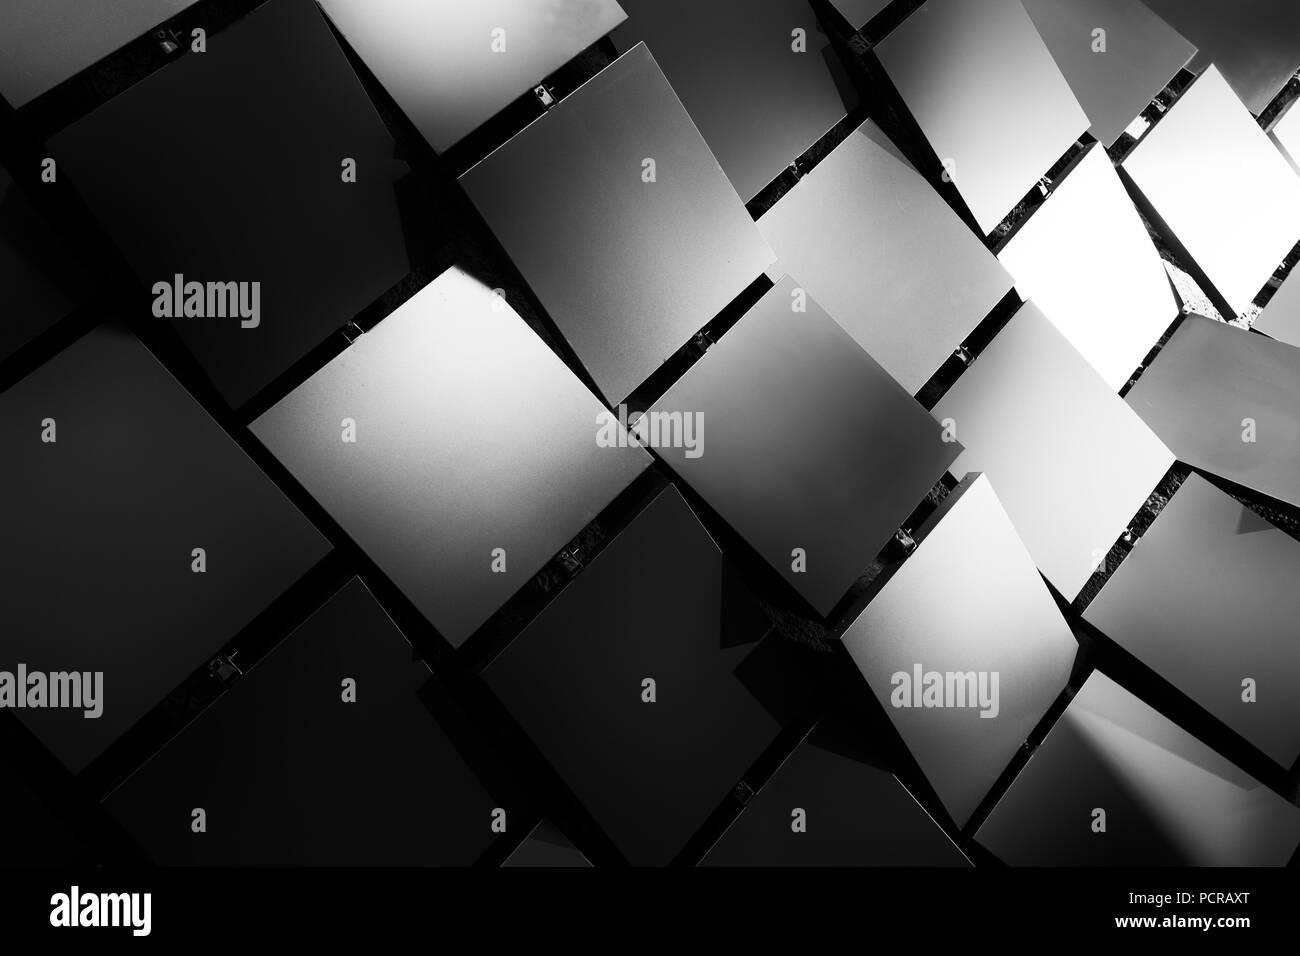 Paneles de pared de metal decorativo, patrón geométrico Imagen De Stock